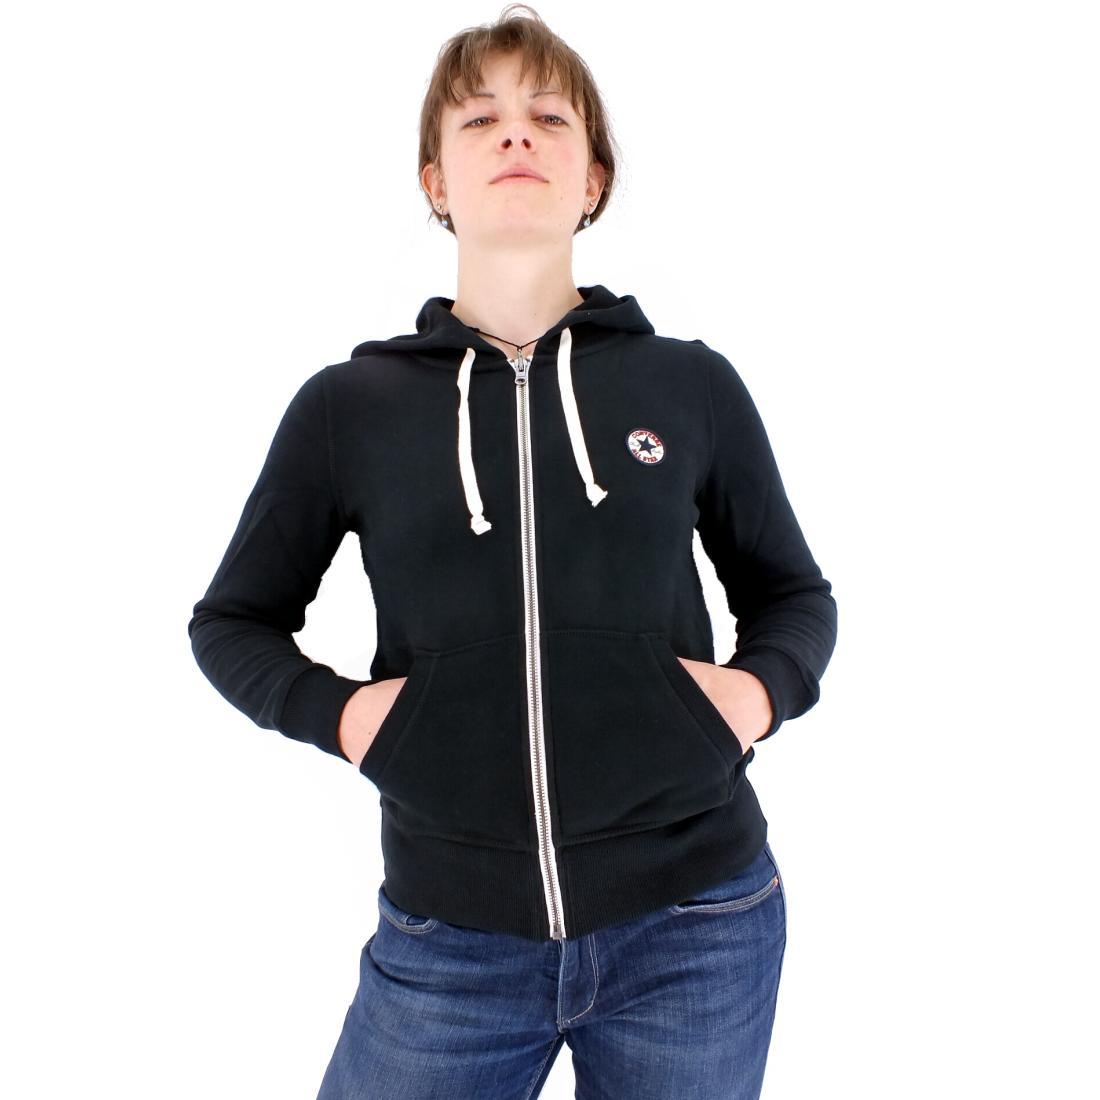 converse core chk patch fz hoodie jacke kapuzenjacke damen rot grau blau schwarz ebay. Black Bedroom Furniture Sets. Home Design Ideas